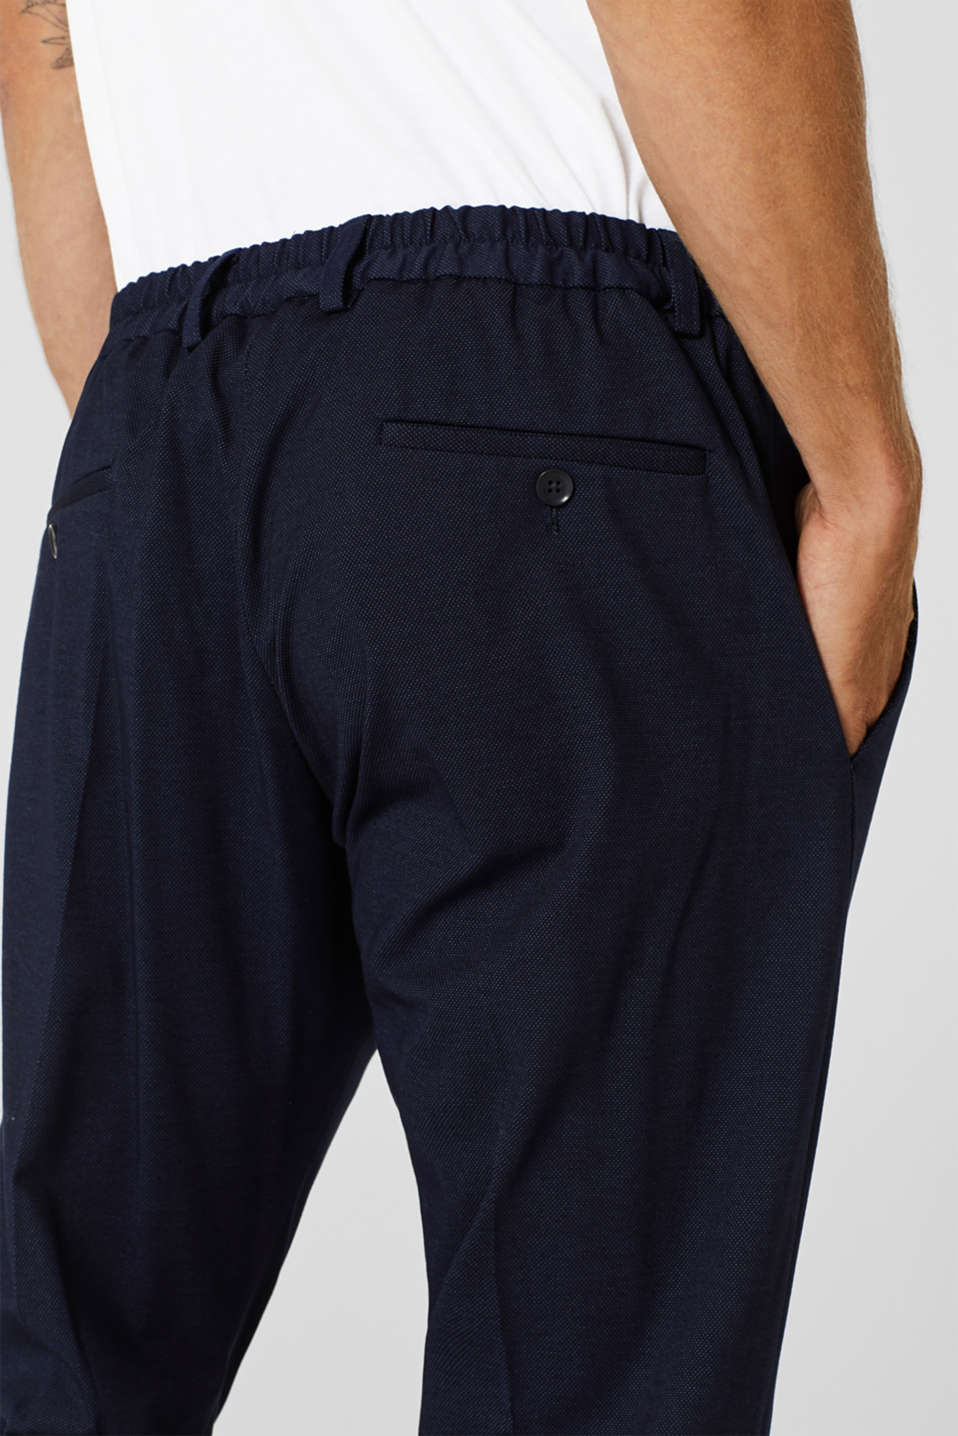 Pants suit, NAVY, detail image number 3